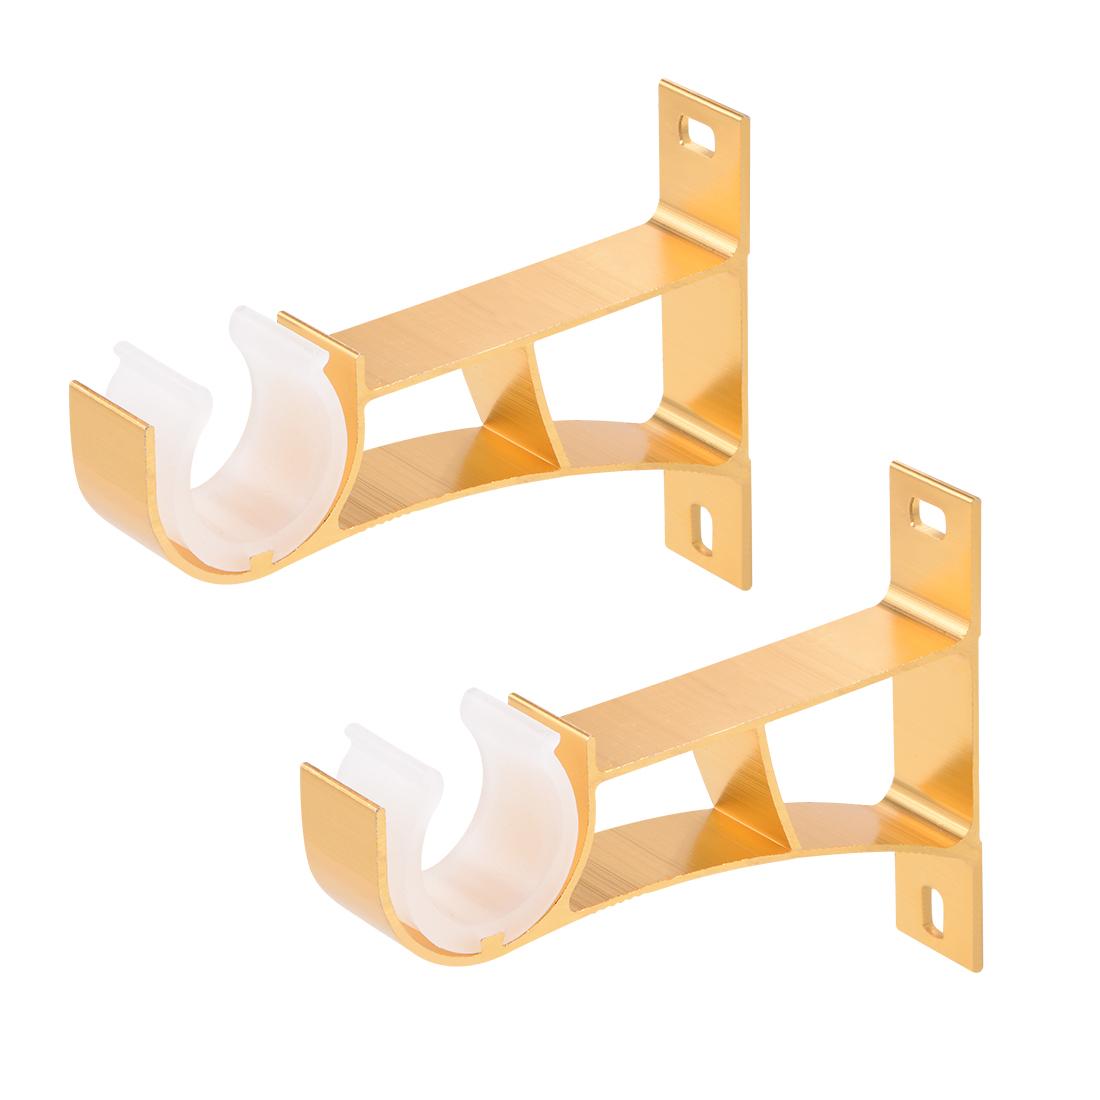 Curtain Rod Bracket Single Holder for 24mm Rod, 108 x 78 x 19mm Golden 2Pcs